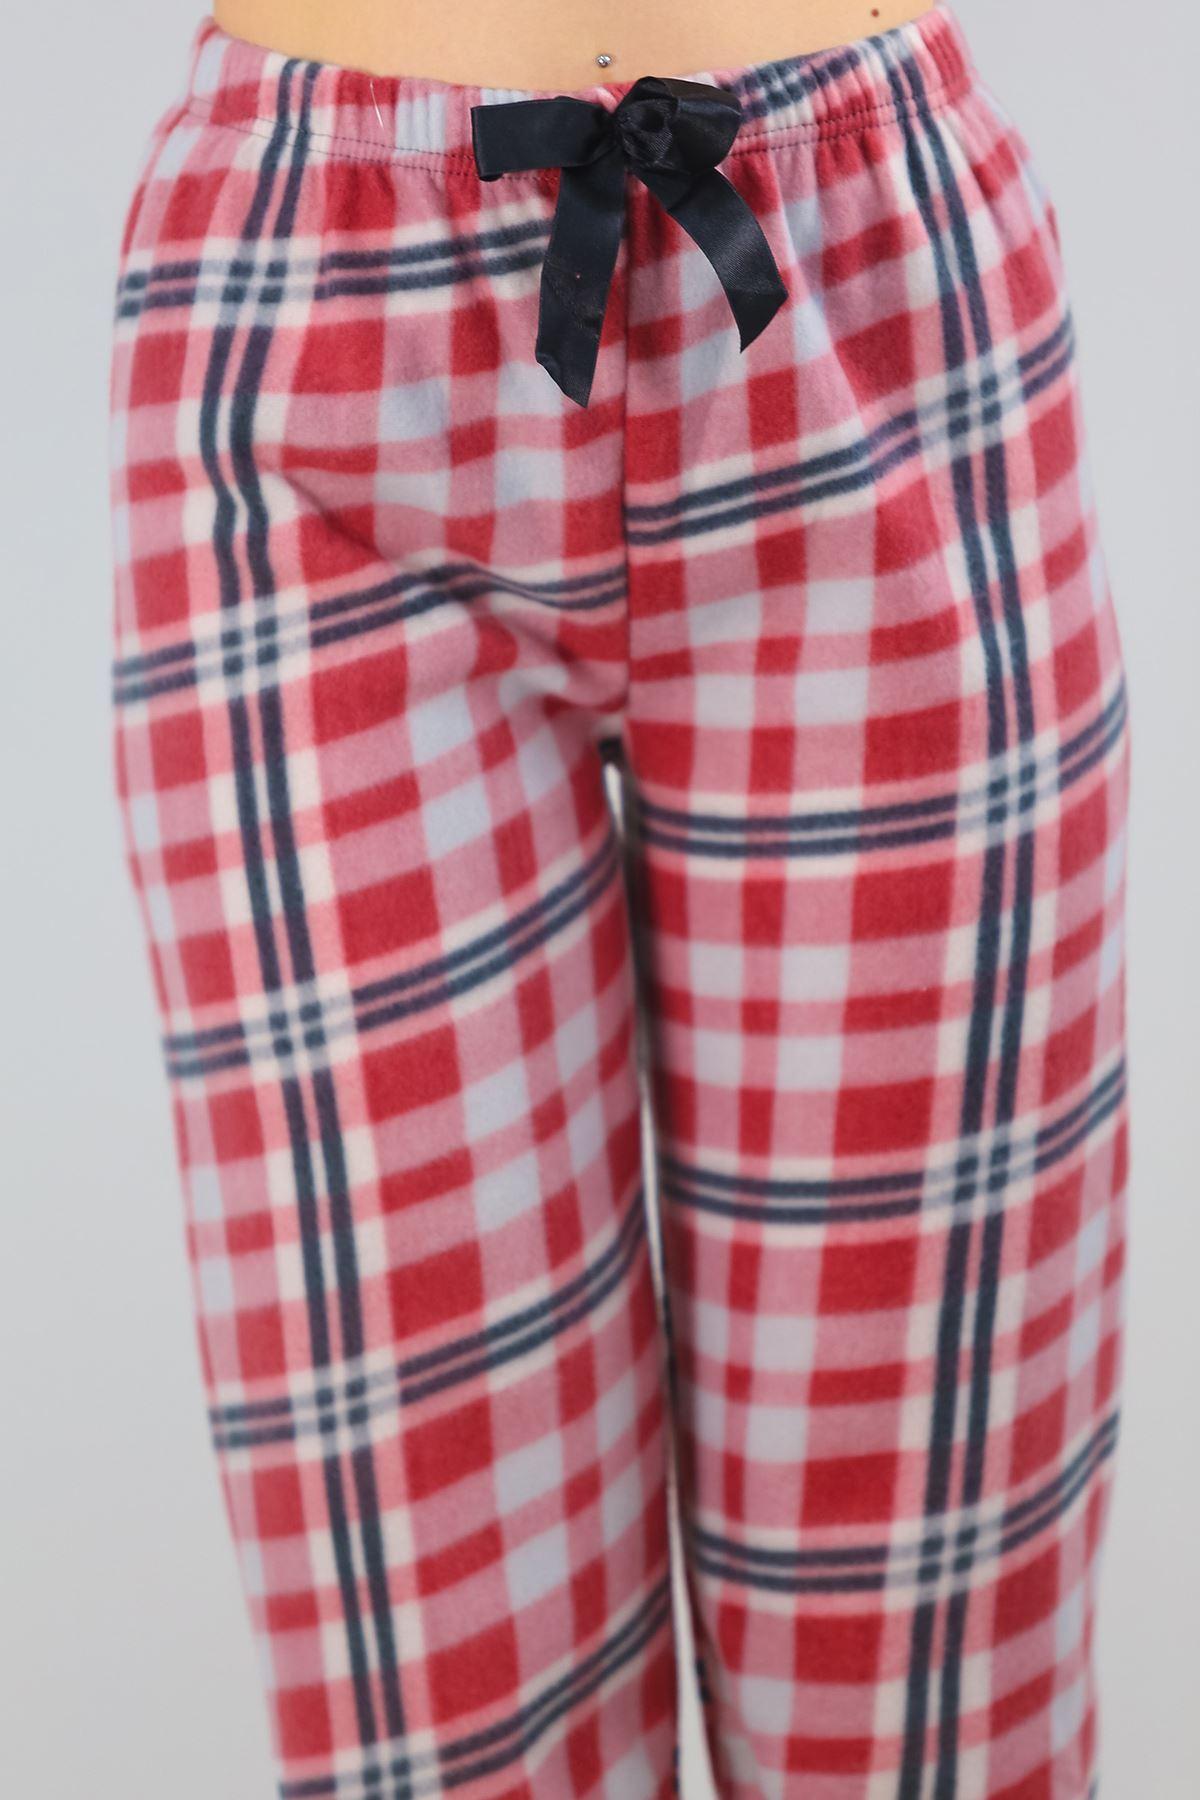 Polar Pijama Altı Karelipembe - 4570.919.